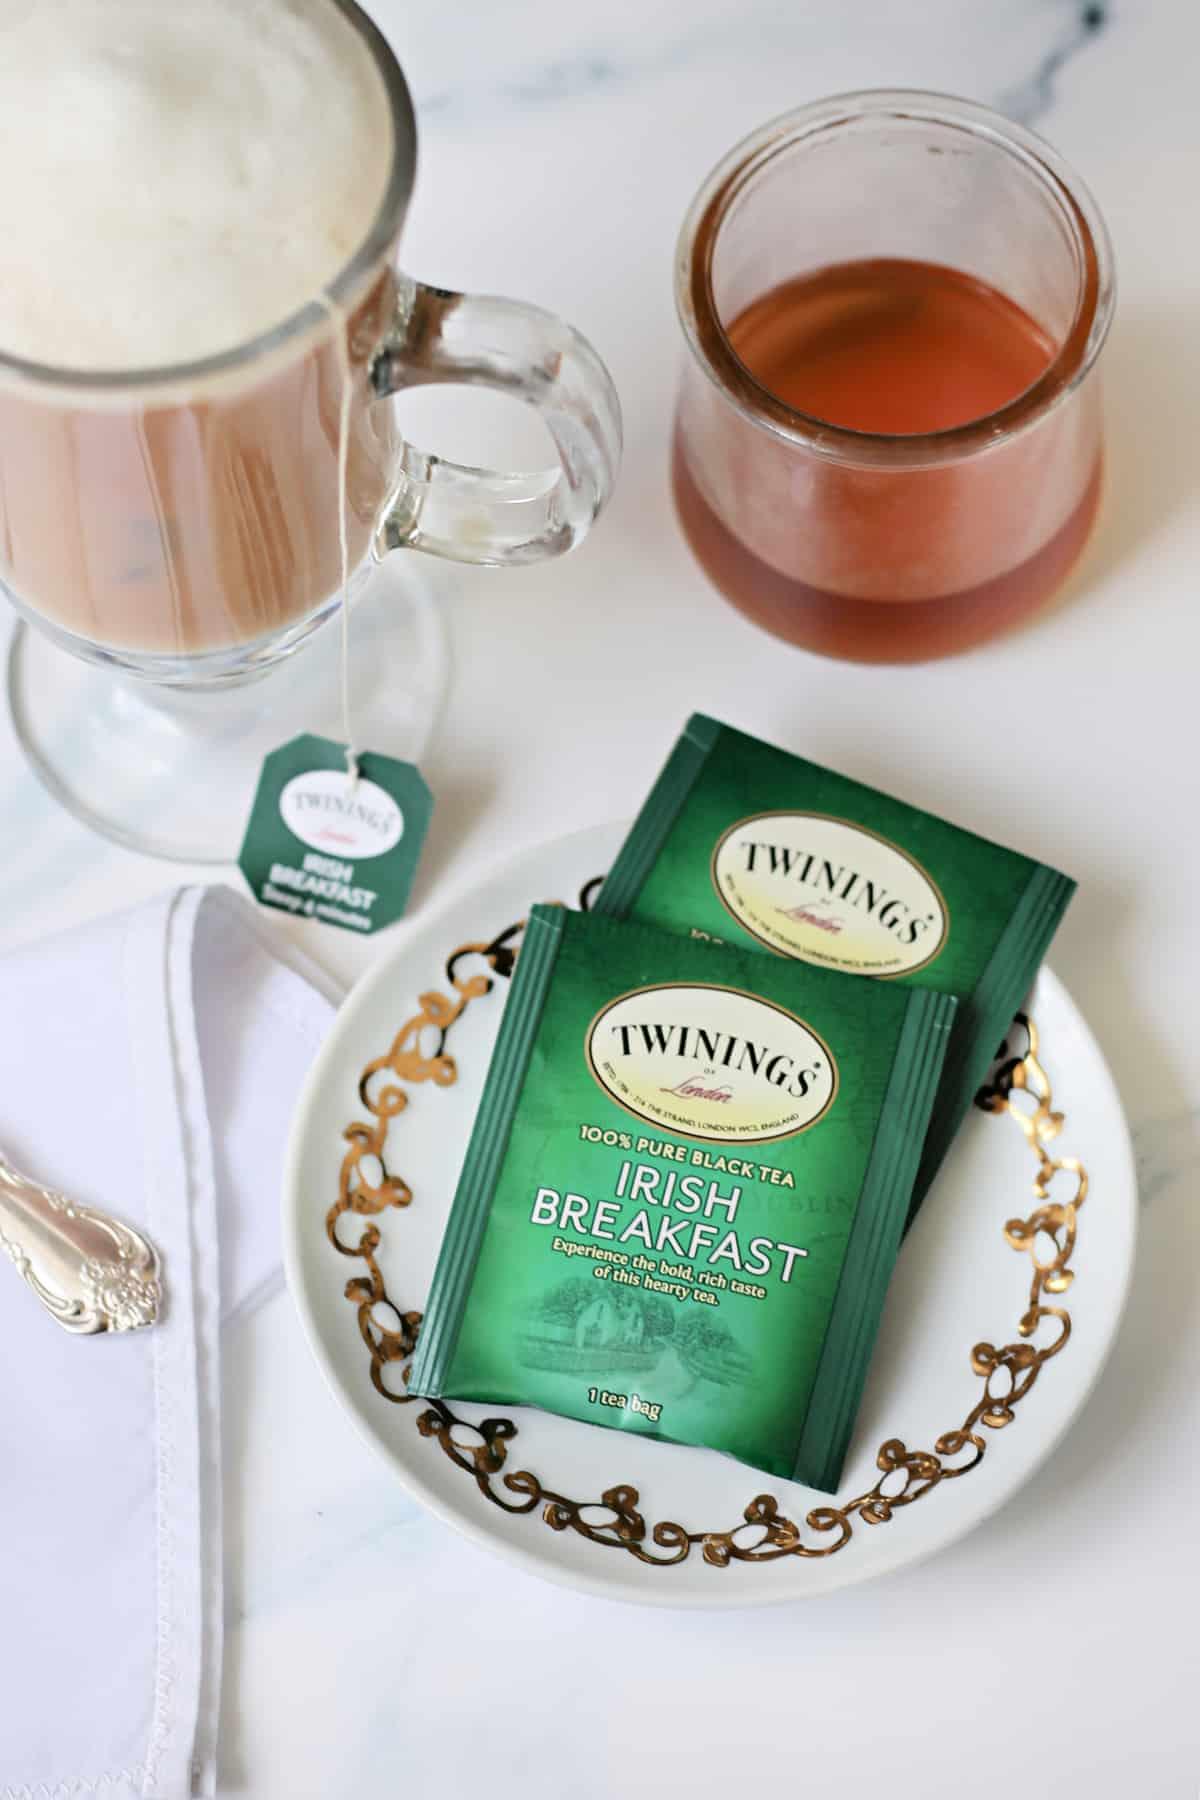 Irish Breakfast Tea bags on a small white plate next to tea latte.